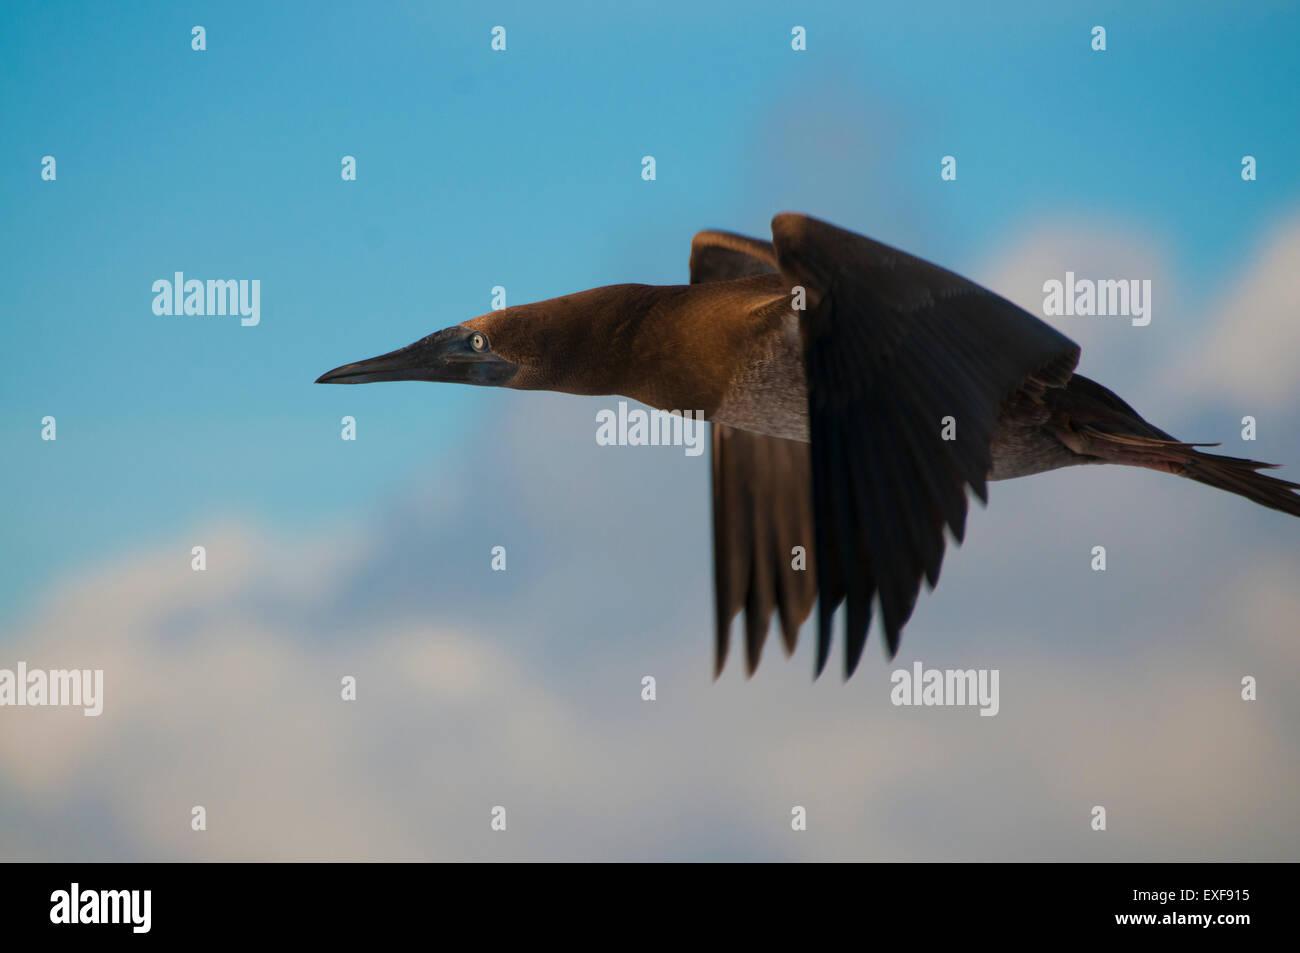 A brown booby (Sula sp.) flying around San Benedicto Island, Revillagigedo, Mexico - Stock Image